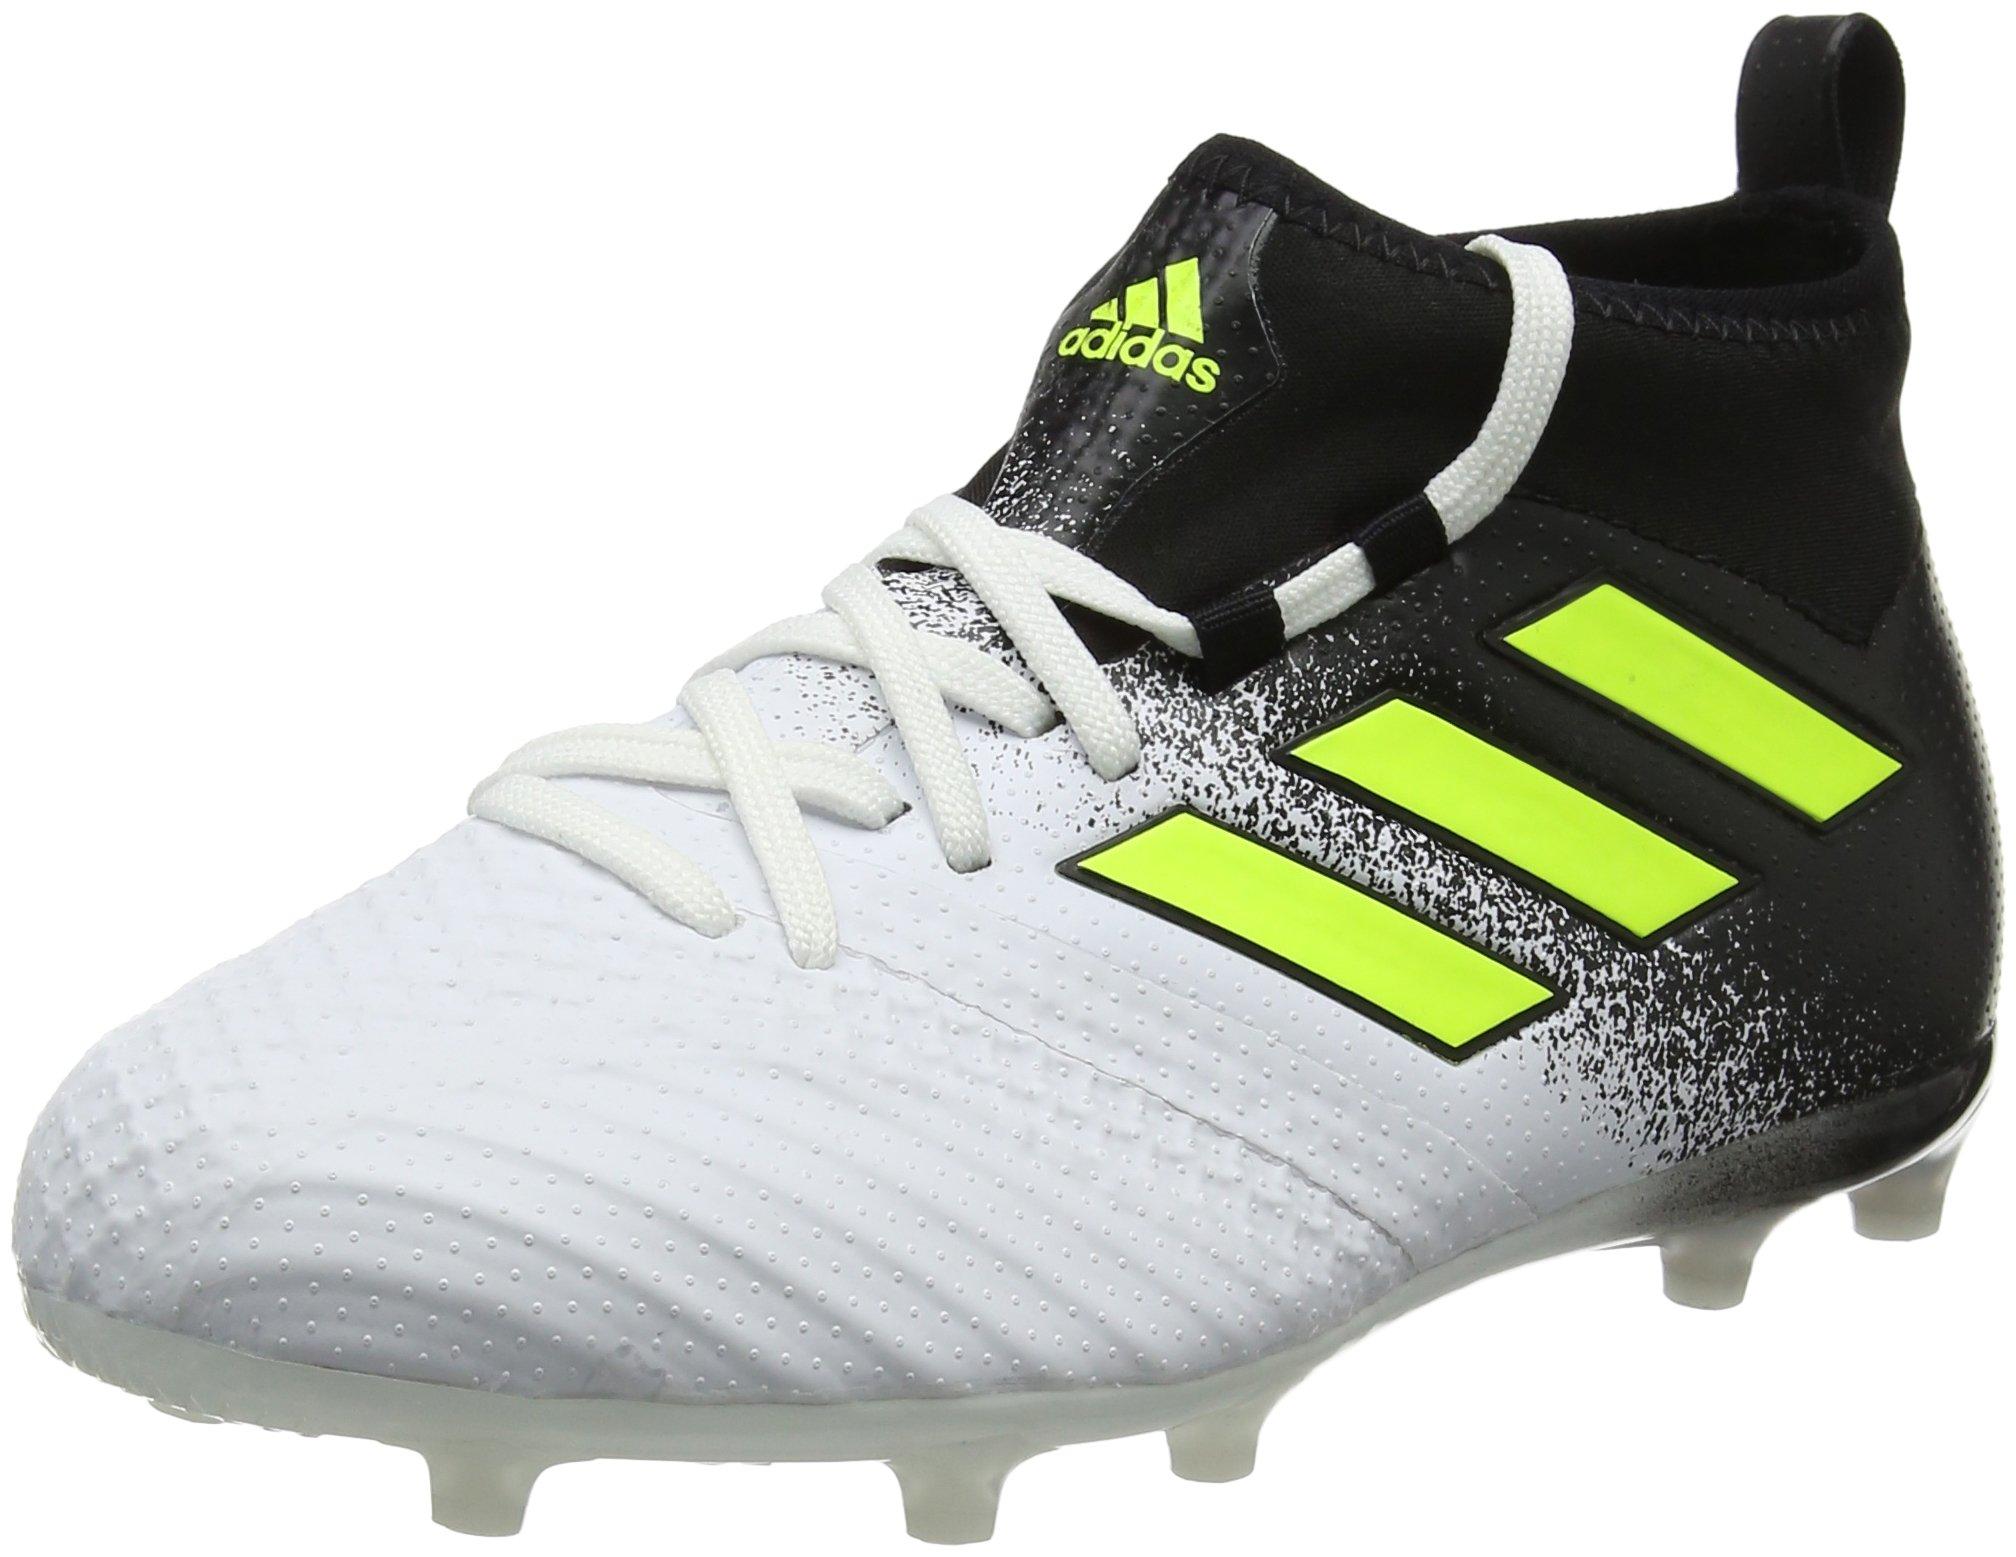 adidas Ace 17.1 FG Junior Football Boots Soccer Cleats (UK 2.5 US 3 EU 35, White Yellow Black S77039)